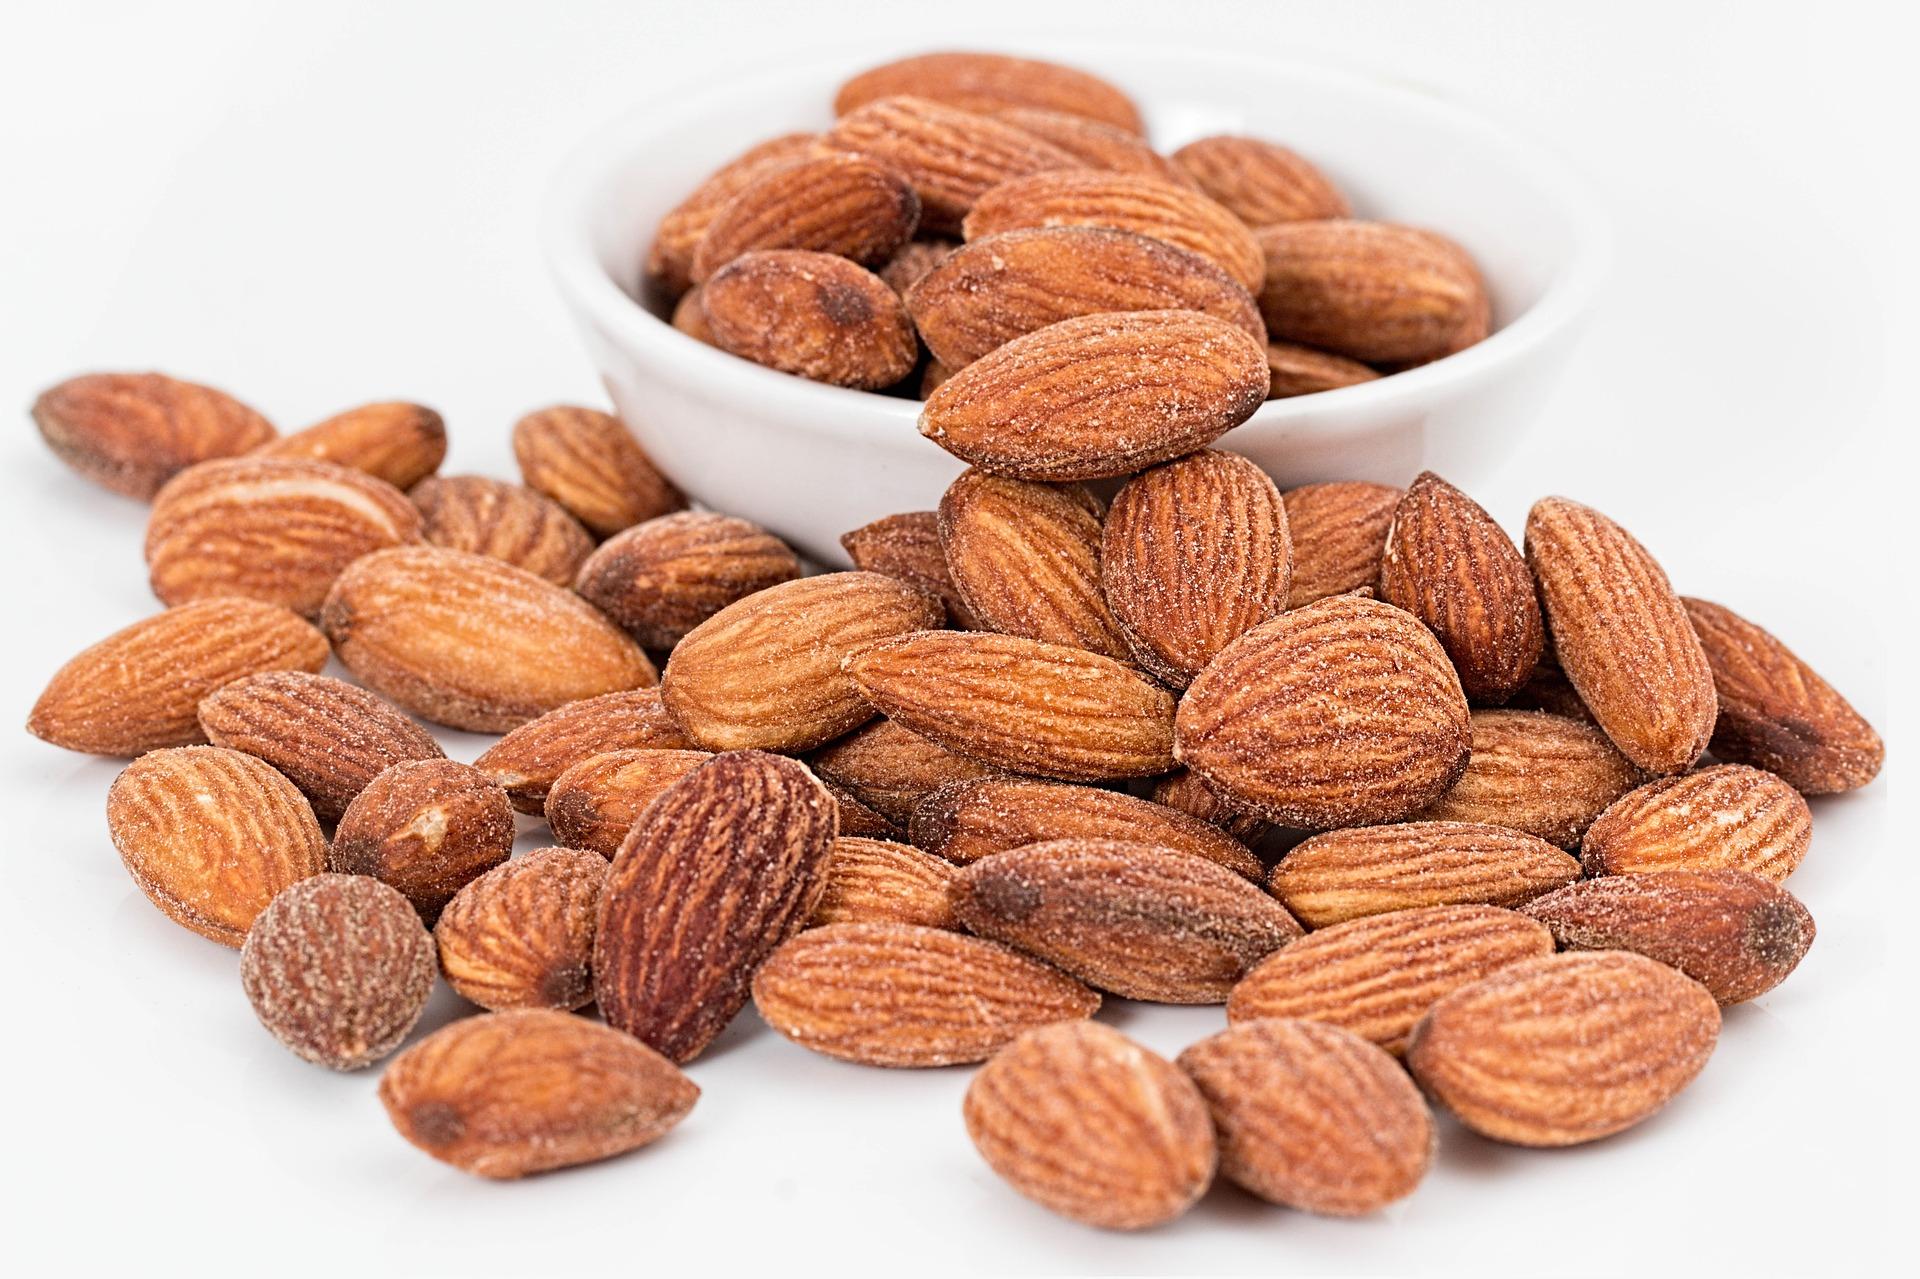 almonds-1768792_1920.jpg